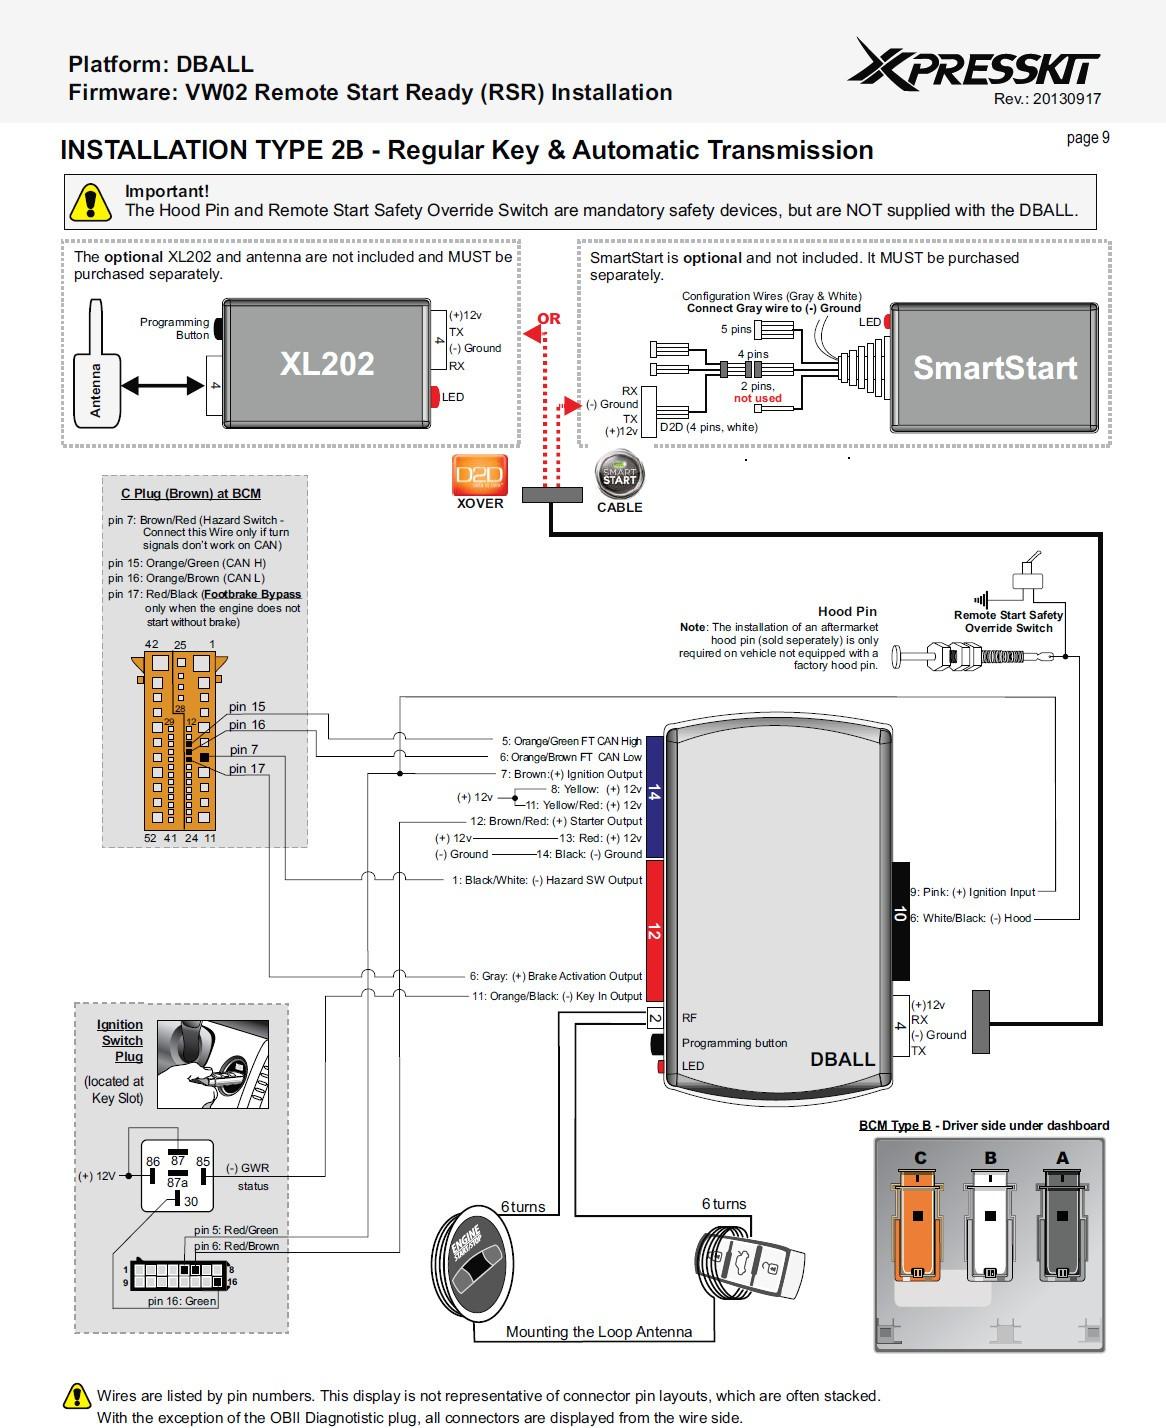 dball2 wiring diagram wiring diagram image rh mainetreasurechest com Dball2 Bypass Module Wiring Diagram dball2 remote start wiring diagram